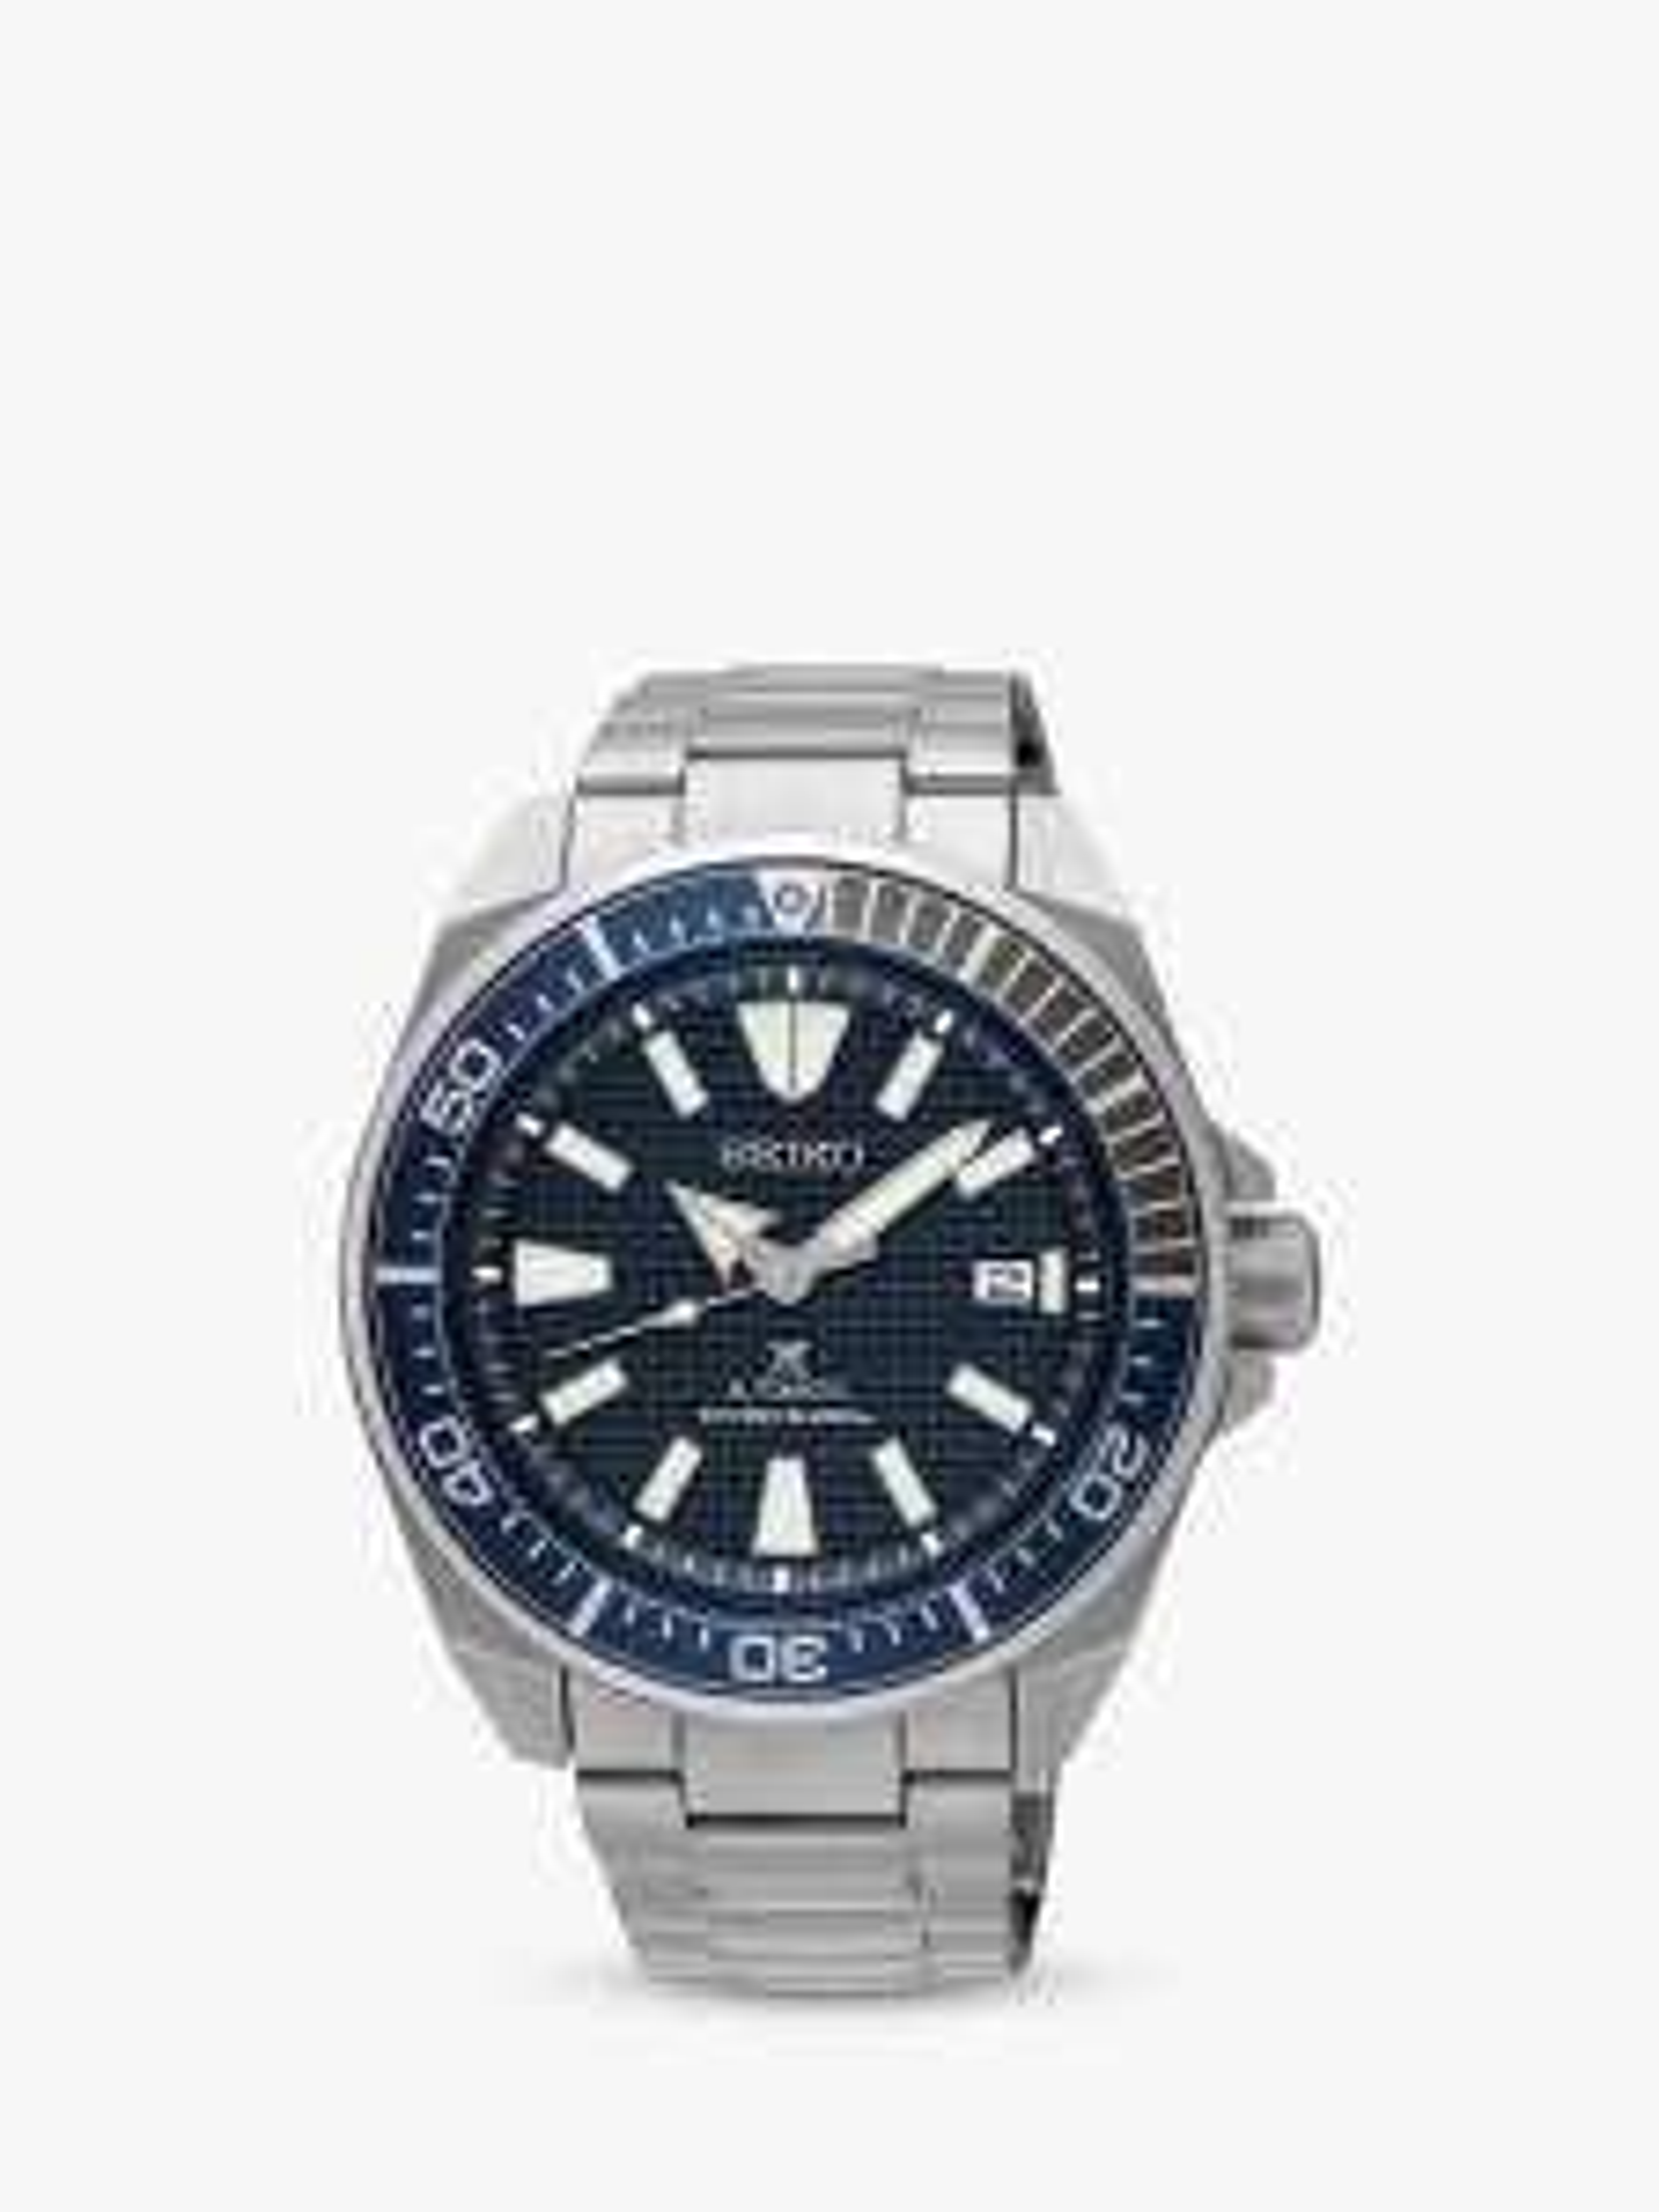 Seiko Prospex Samurai Divers Mens Watch SRPB49K1 - £255.20 delivered using code @ Chisholm Hunter